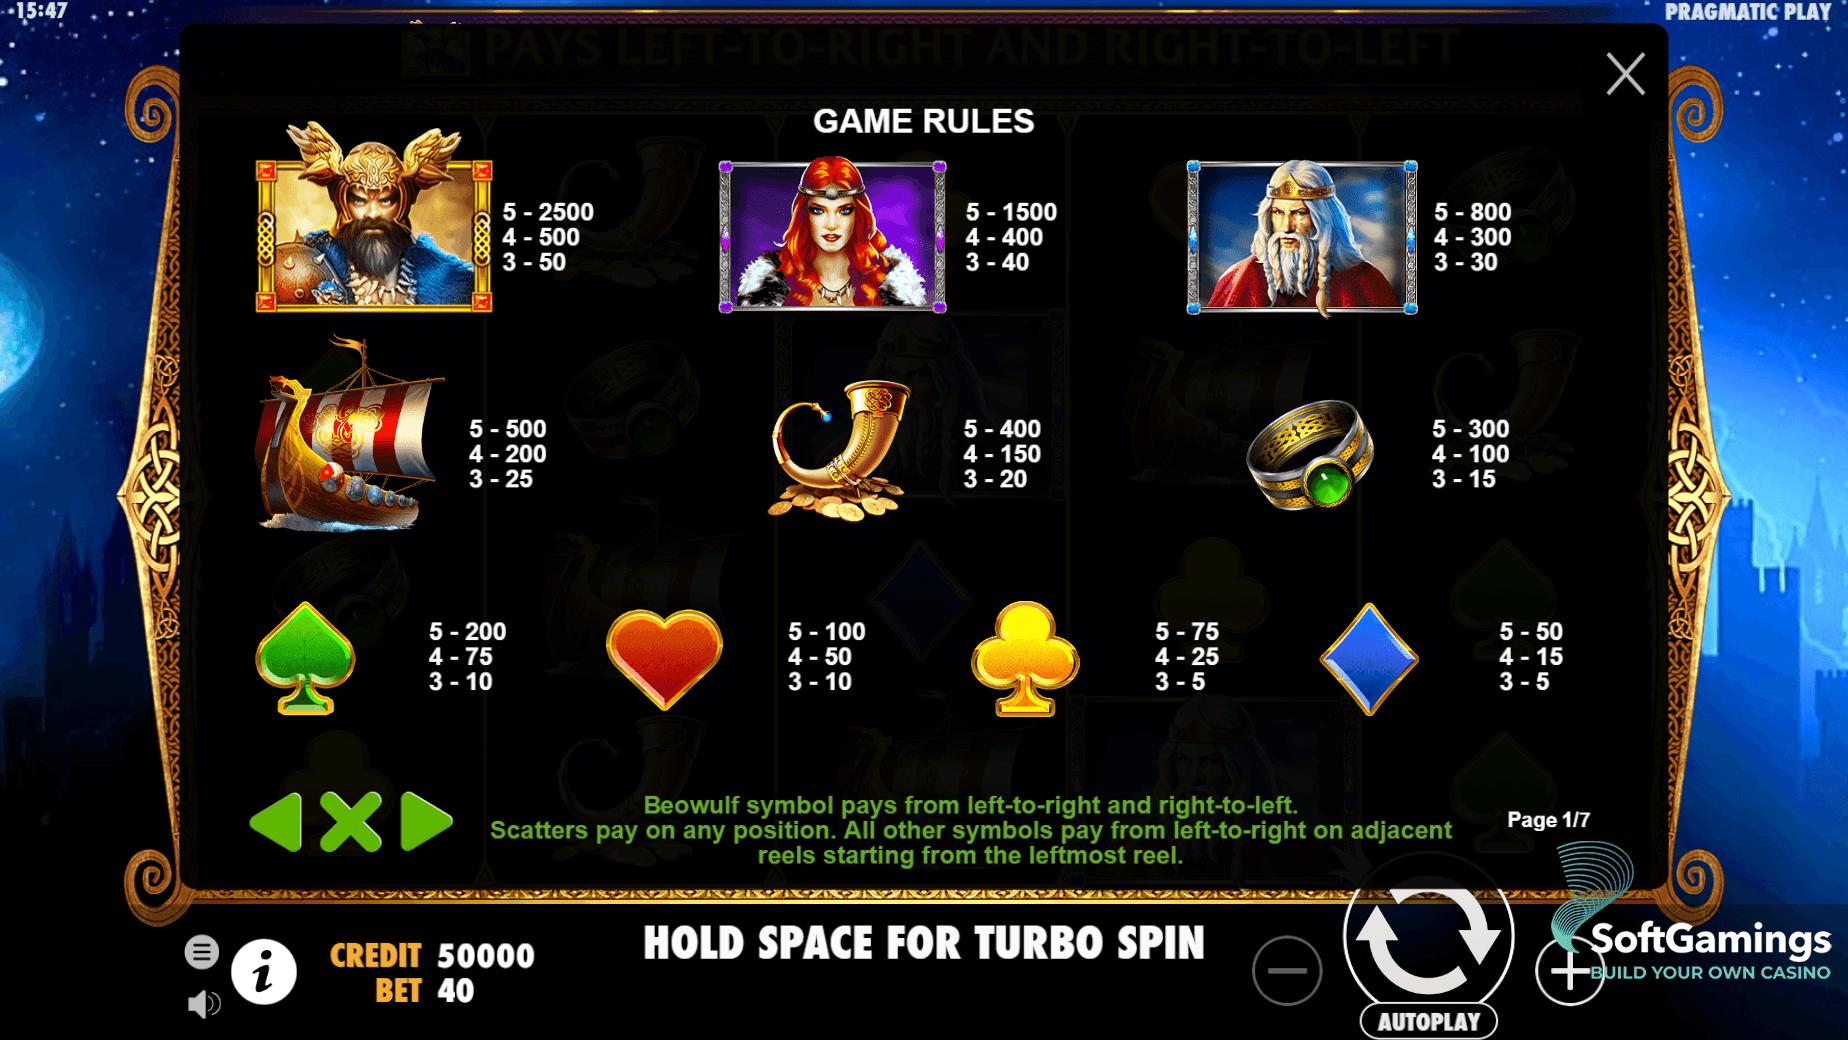 Casino online beowulf 541117